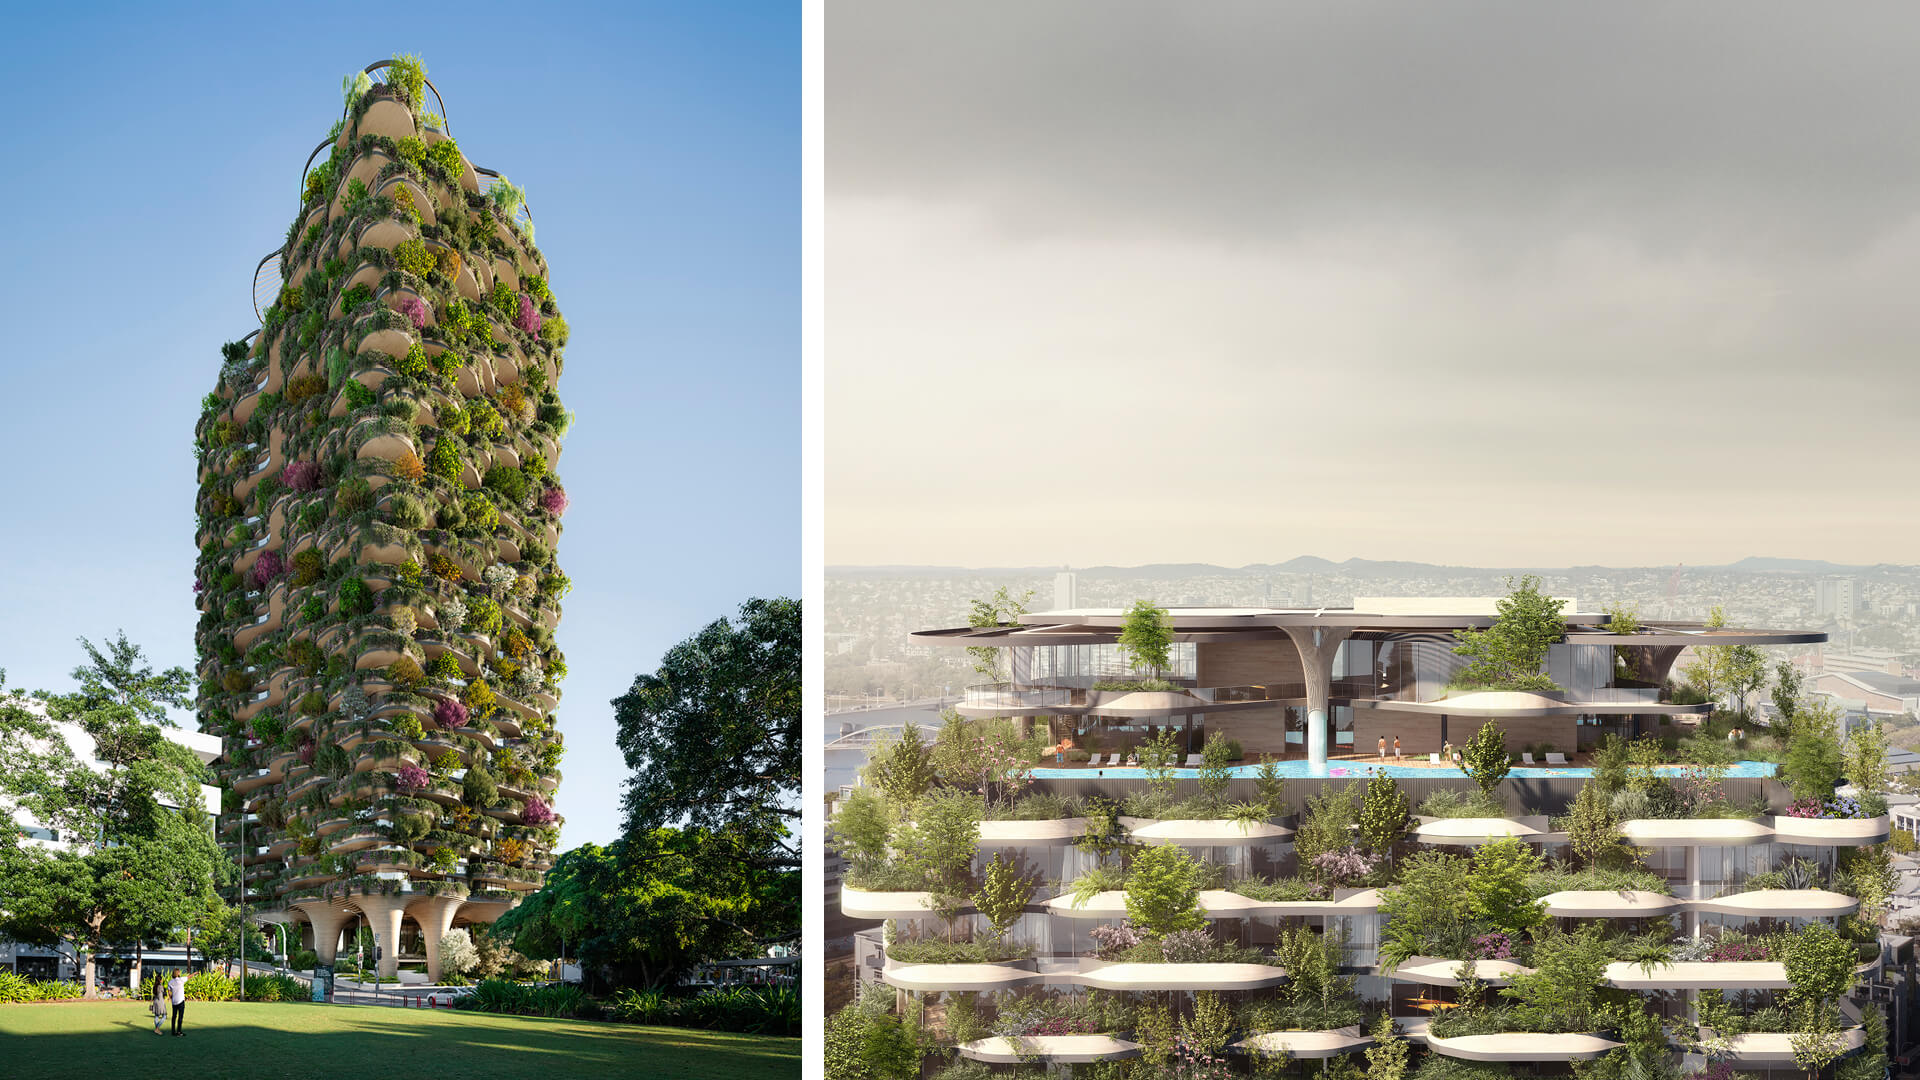 A glimpse of 'Urban Forest' in Brisbane by Koichi Takada Architects | Urban Forest by Koichi Takada Architects | STIRworld